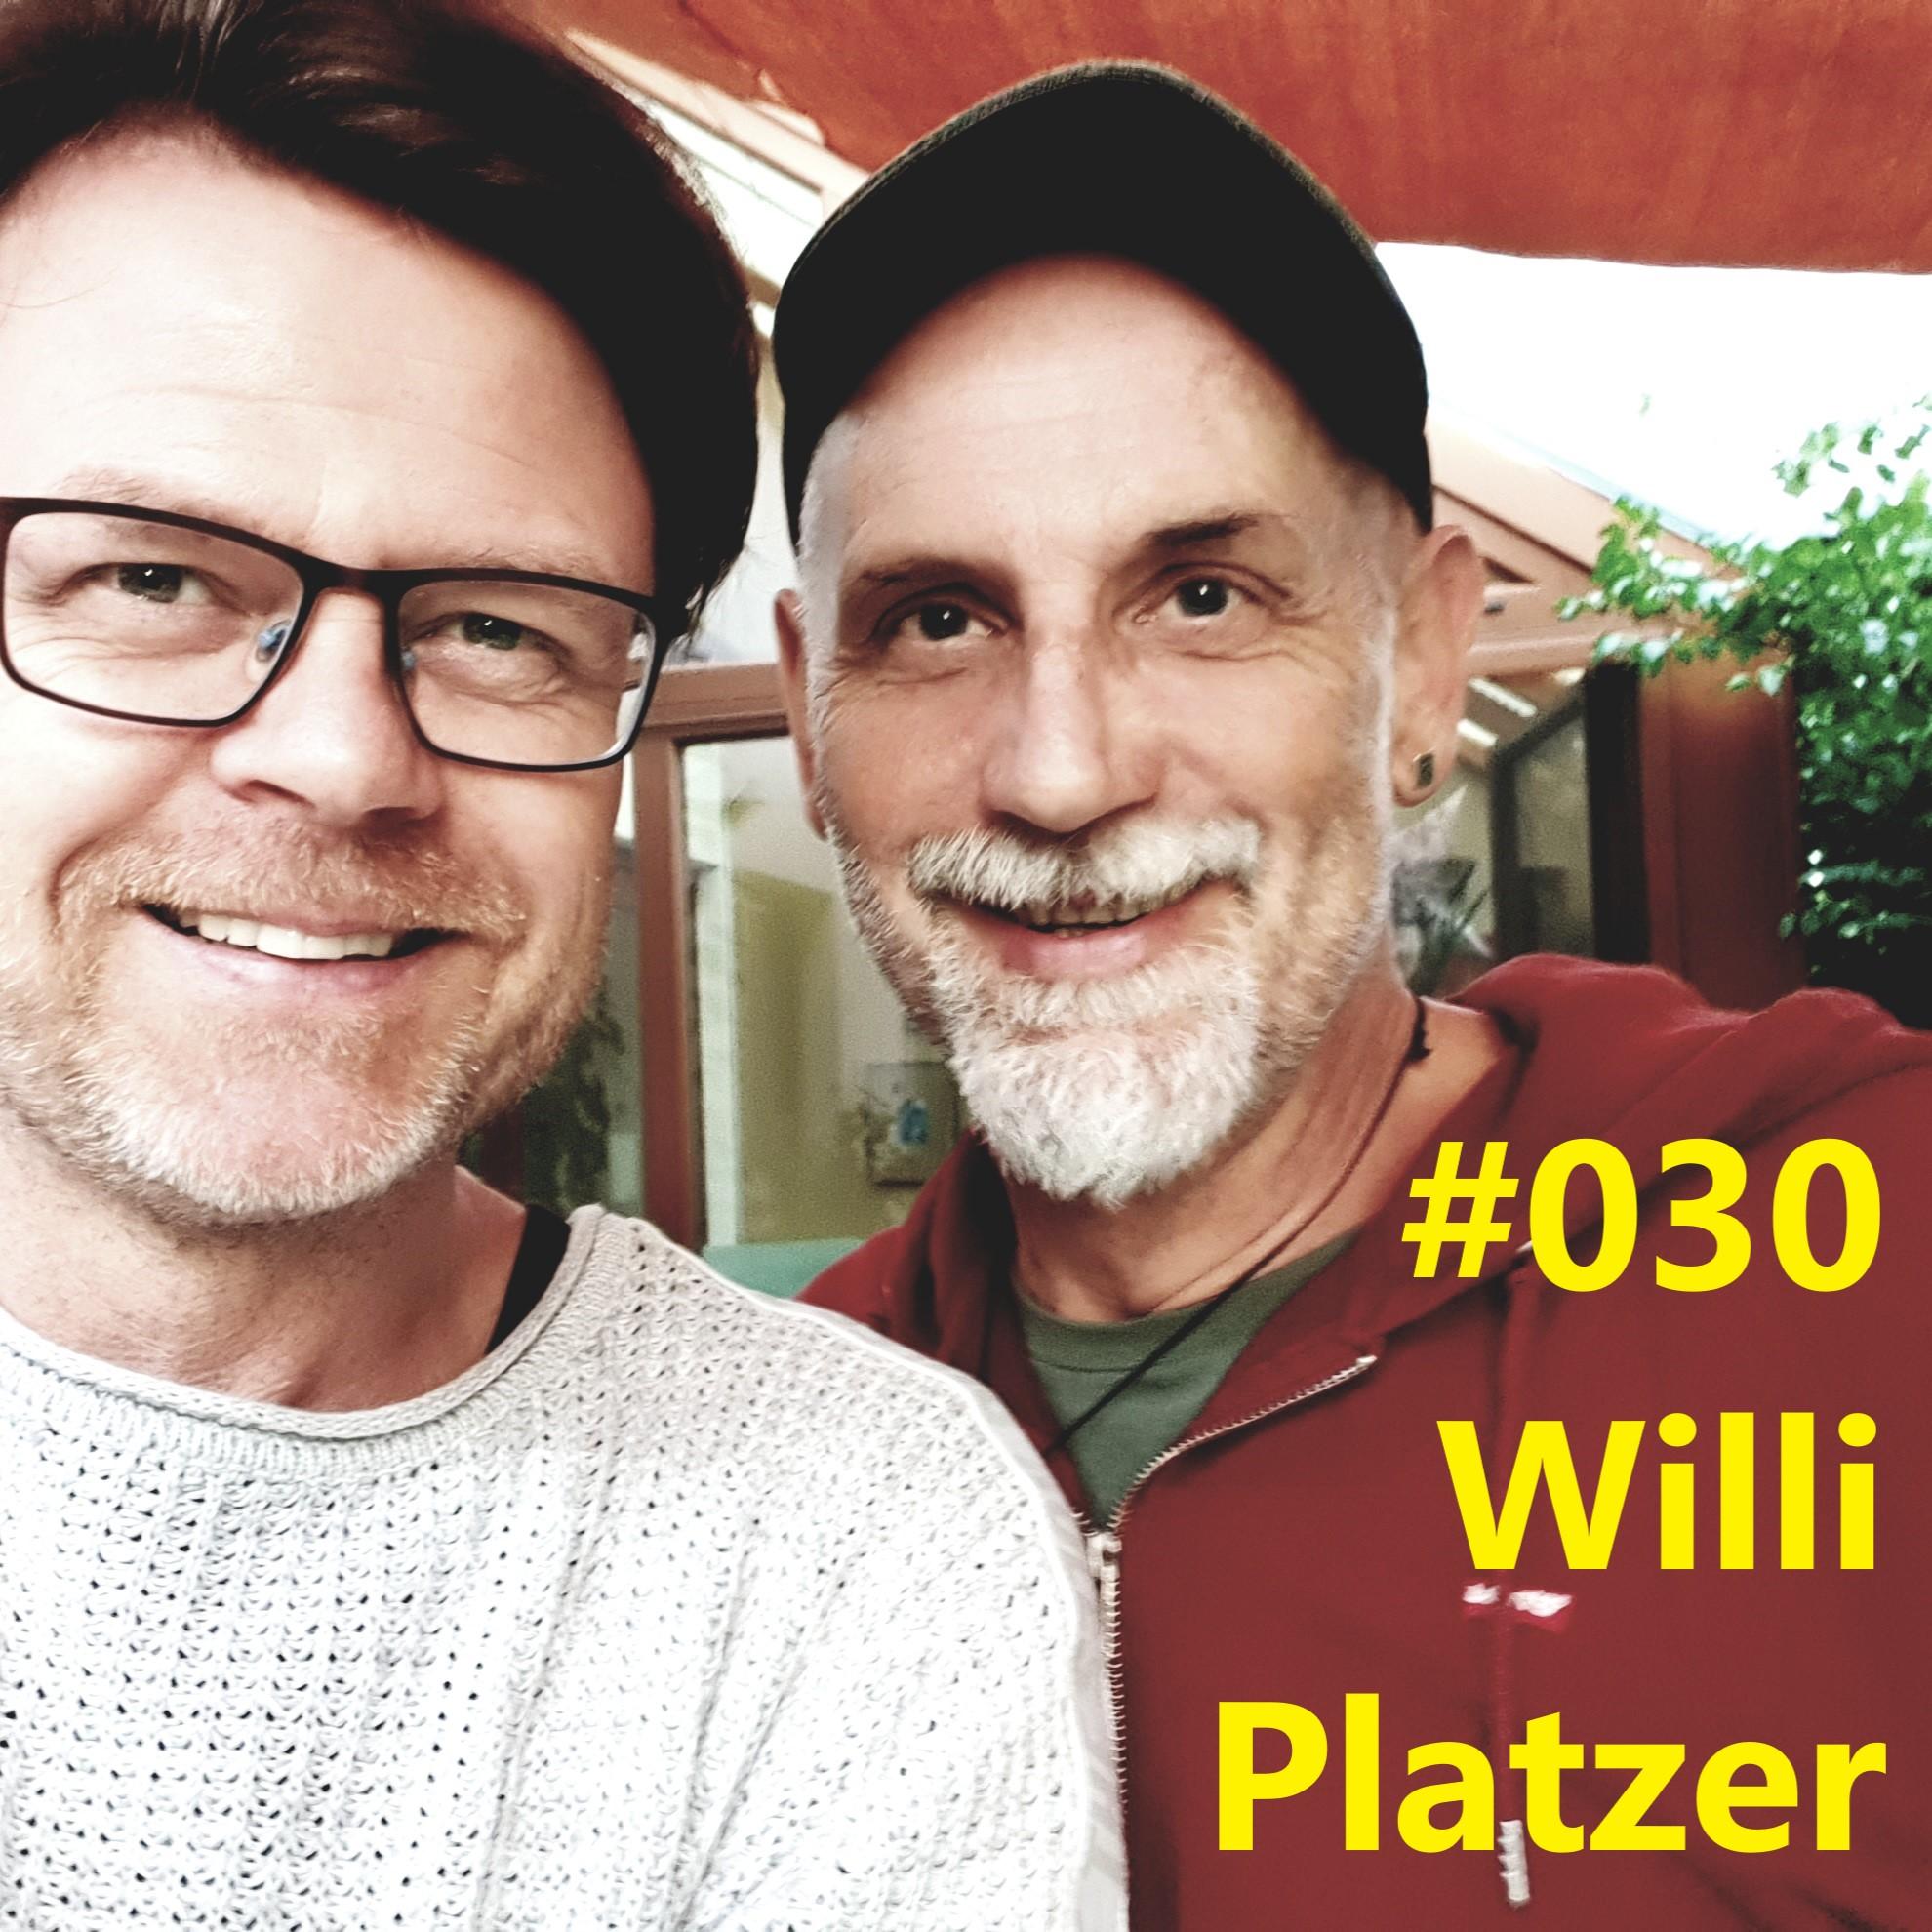 Willi Platzer